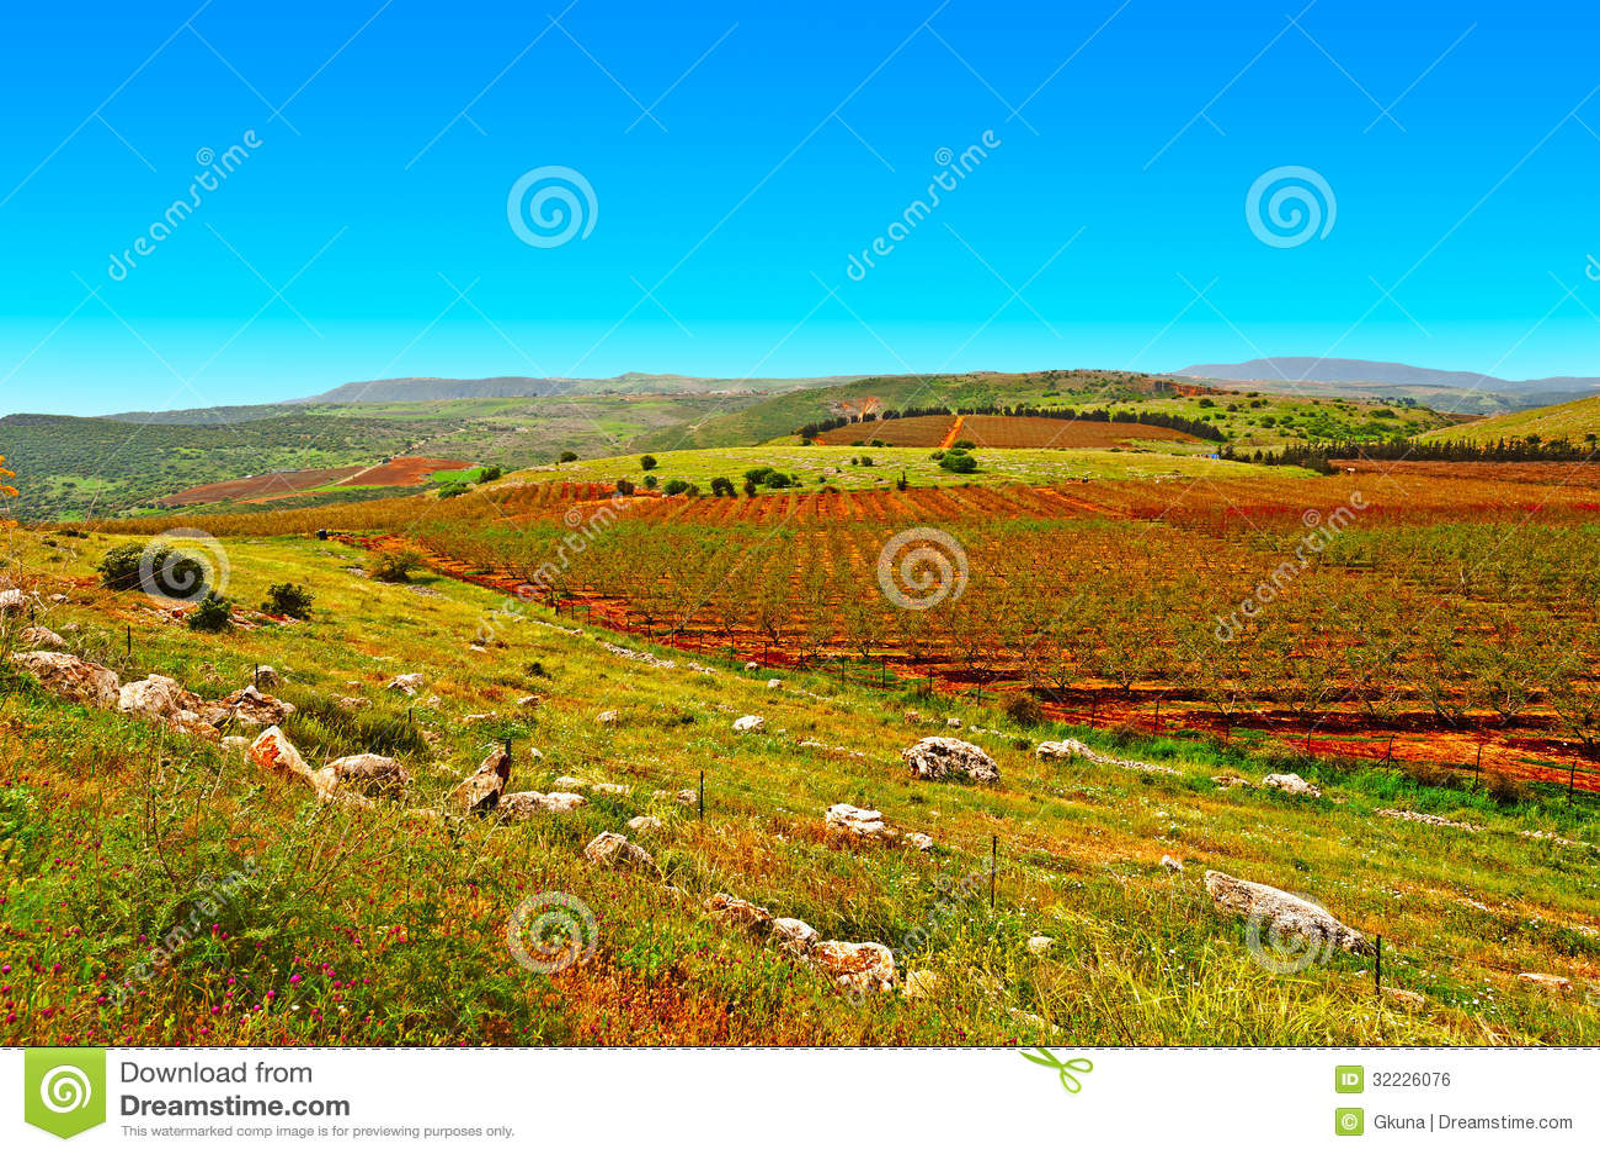 Download Golan Heights foto de stock. Imagem de azul, cultivar - 32226076